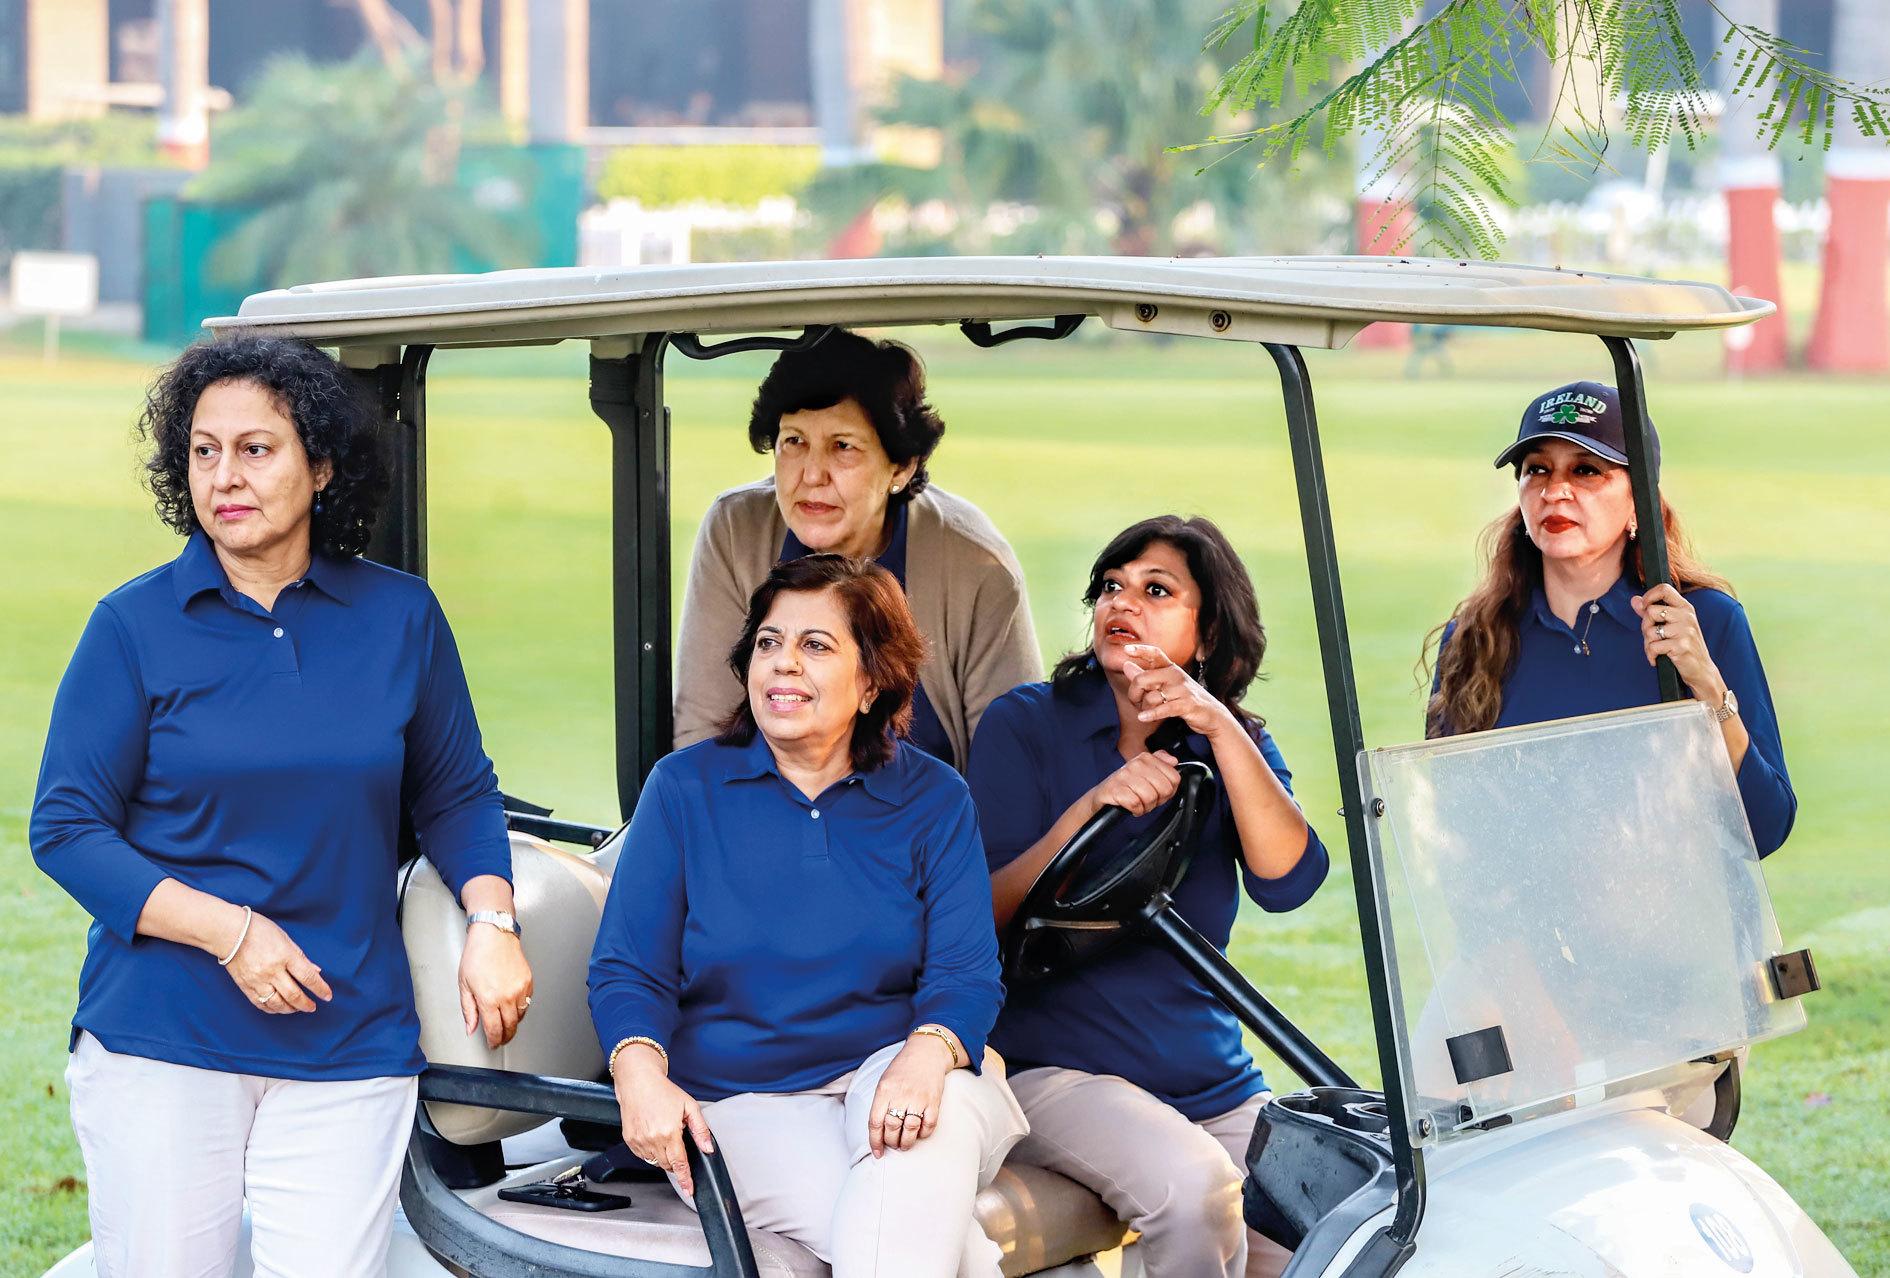 Members of Noida Golf Club (ladies), who organised the event, watch  the game. (L-R) Madhu Sharma, Kiran Chowdhury (Captain), Mariam Ali  (behind Kiran), Seema Singh (at the wheel), Faryal Shadab